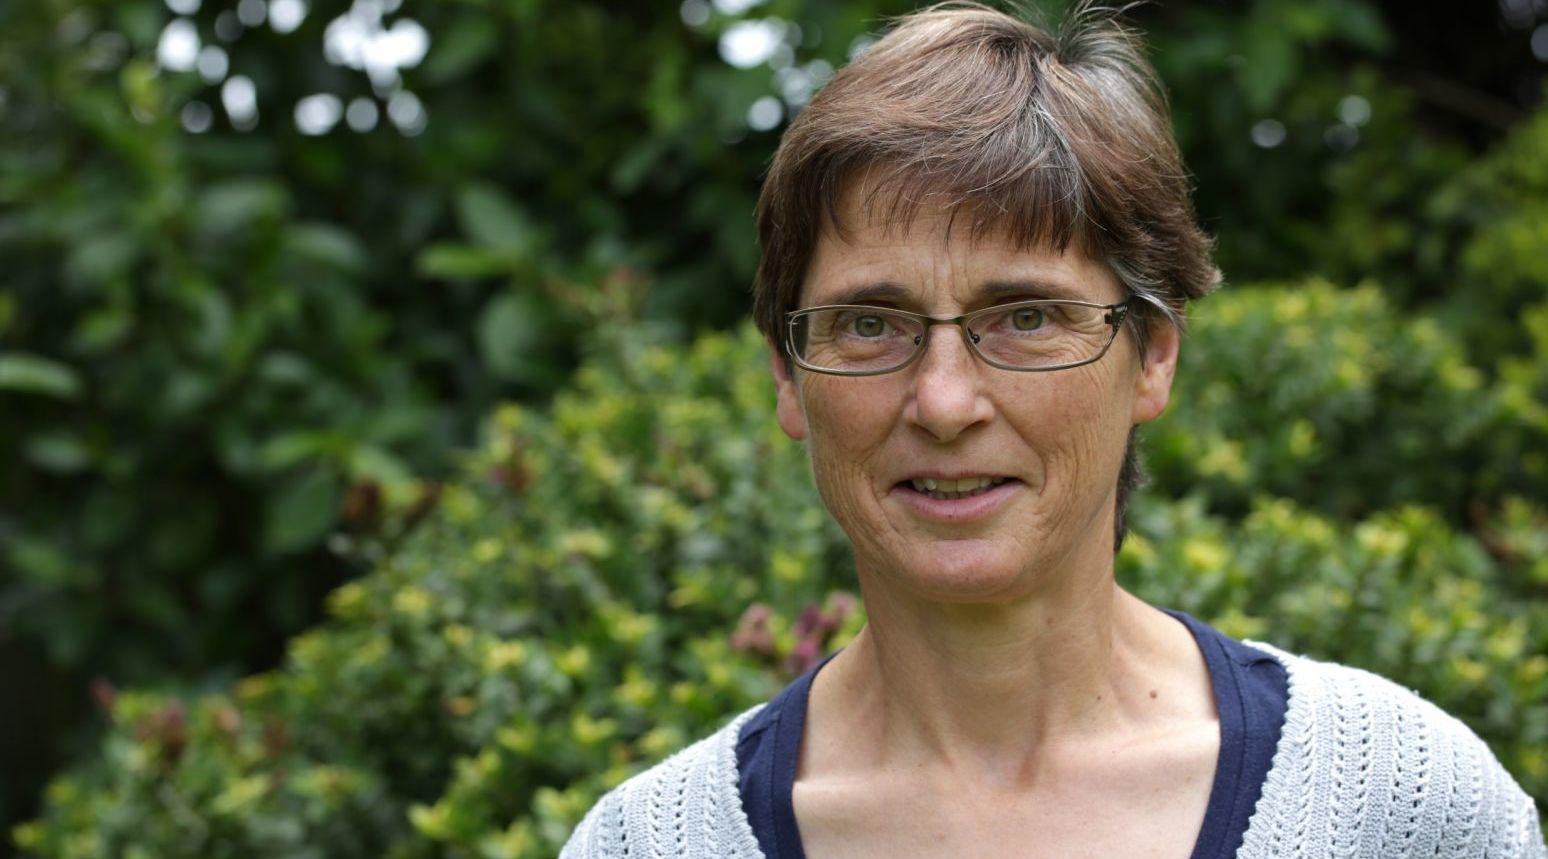 Catherine van Paassen